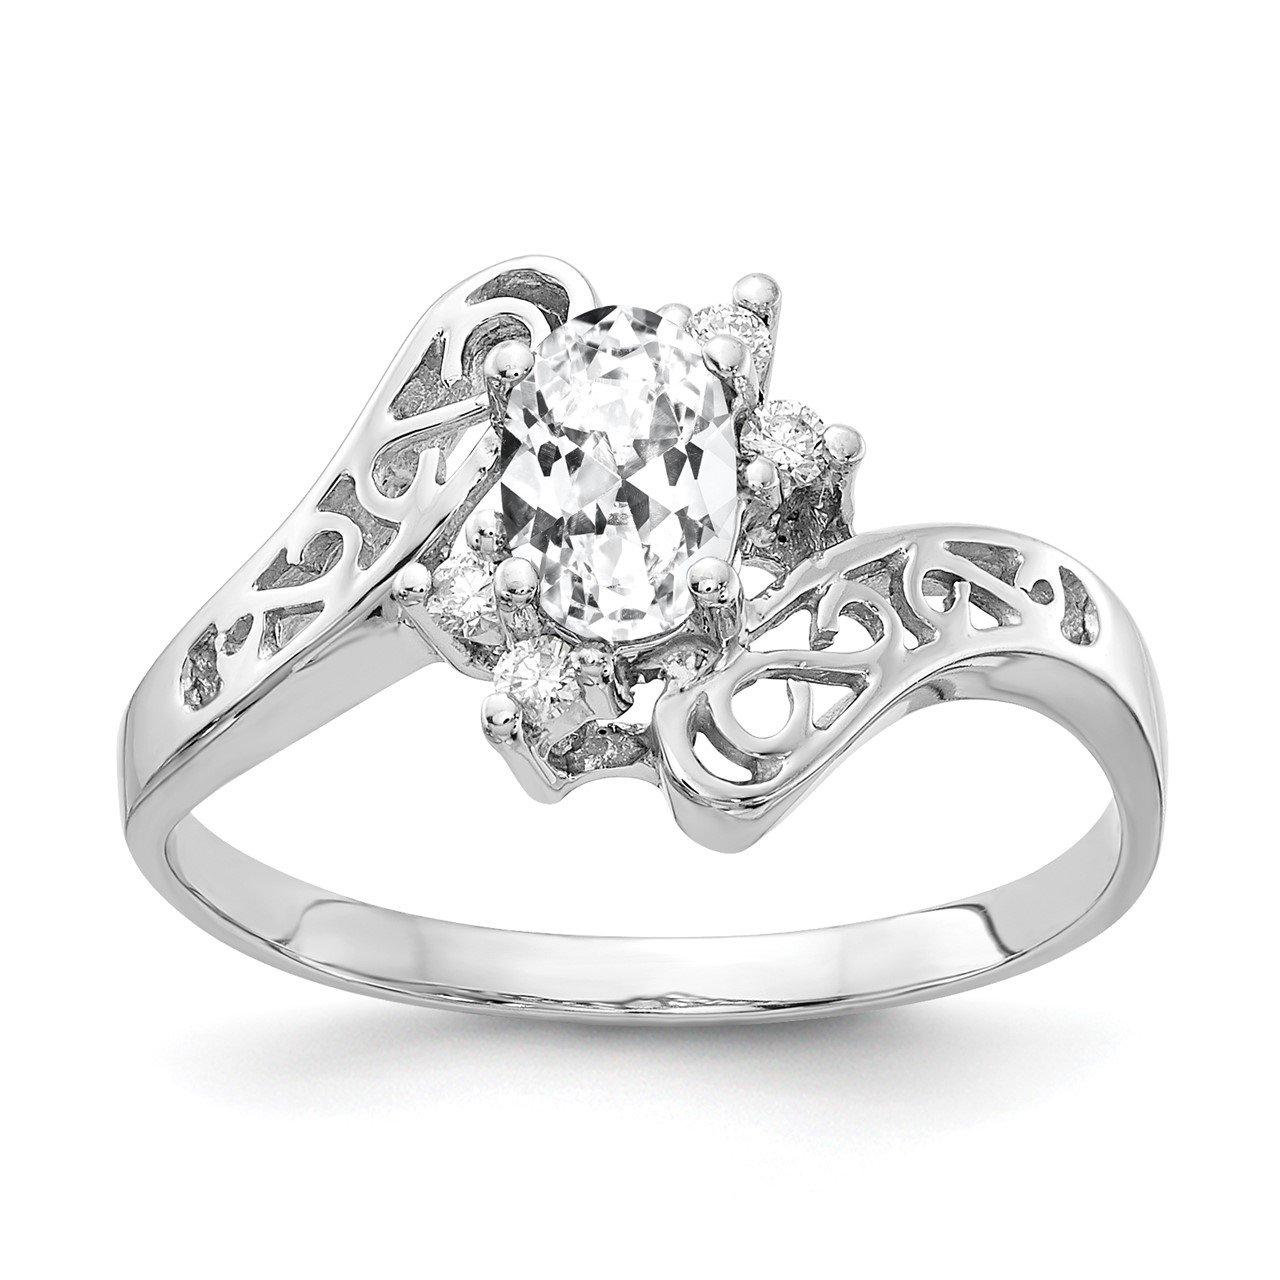 14k White Gold 6x4mm Oval Cubic Zirconia AA Diamond ring